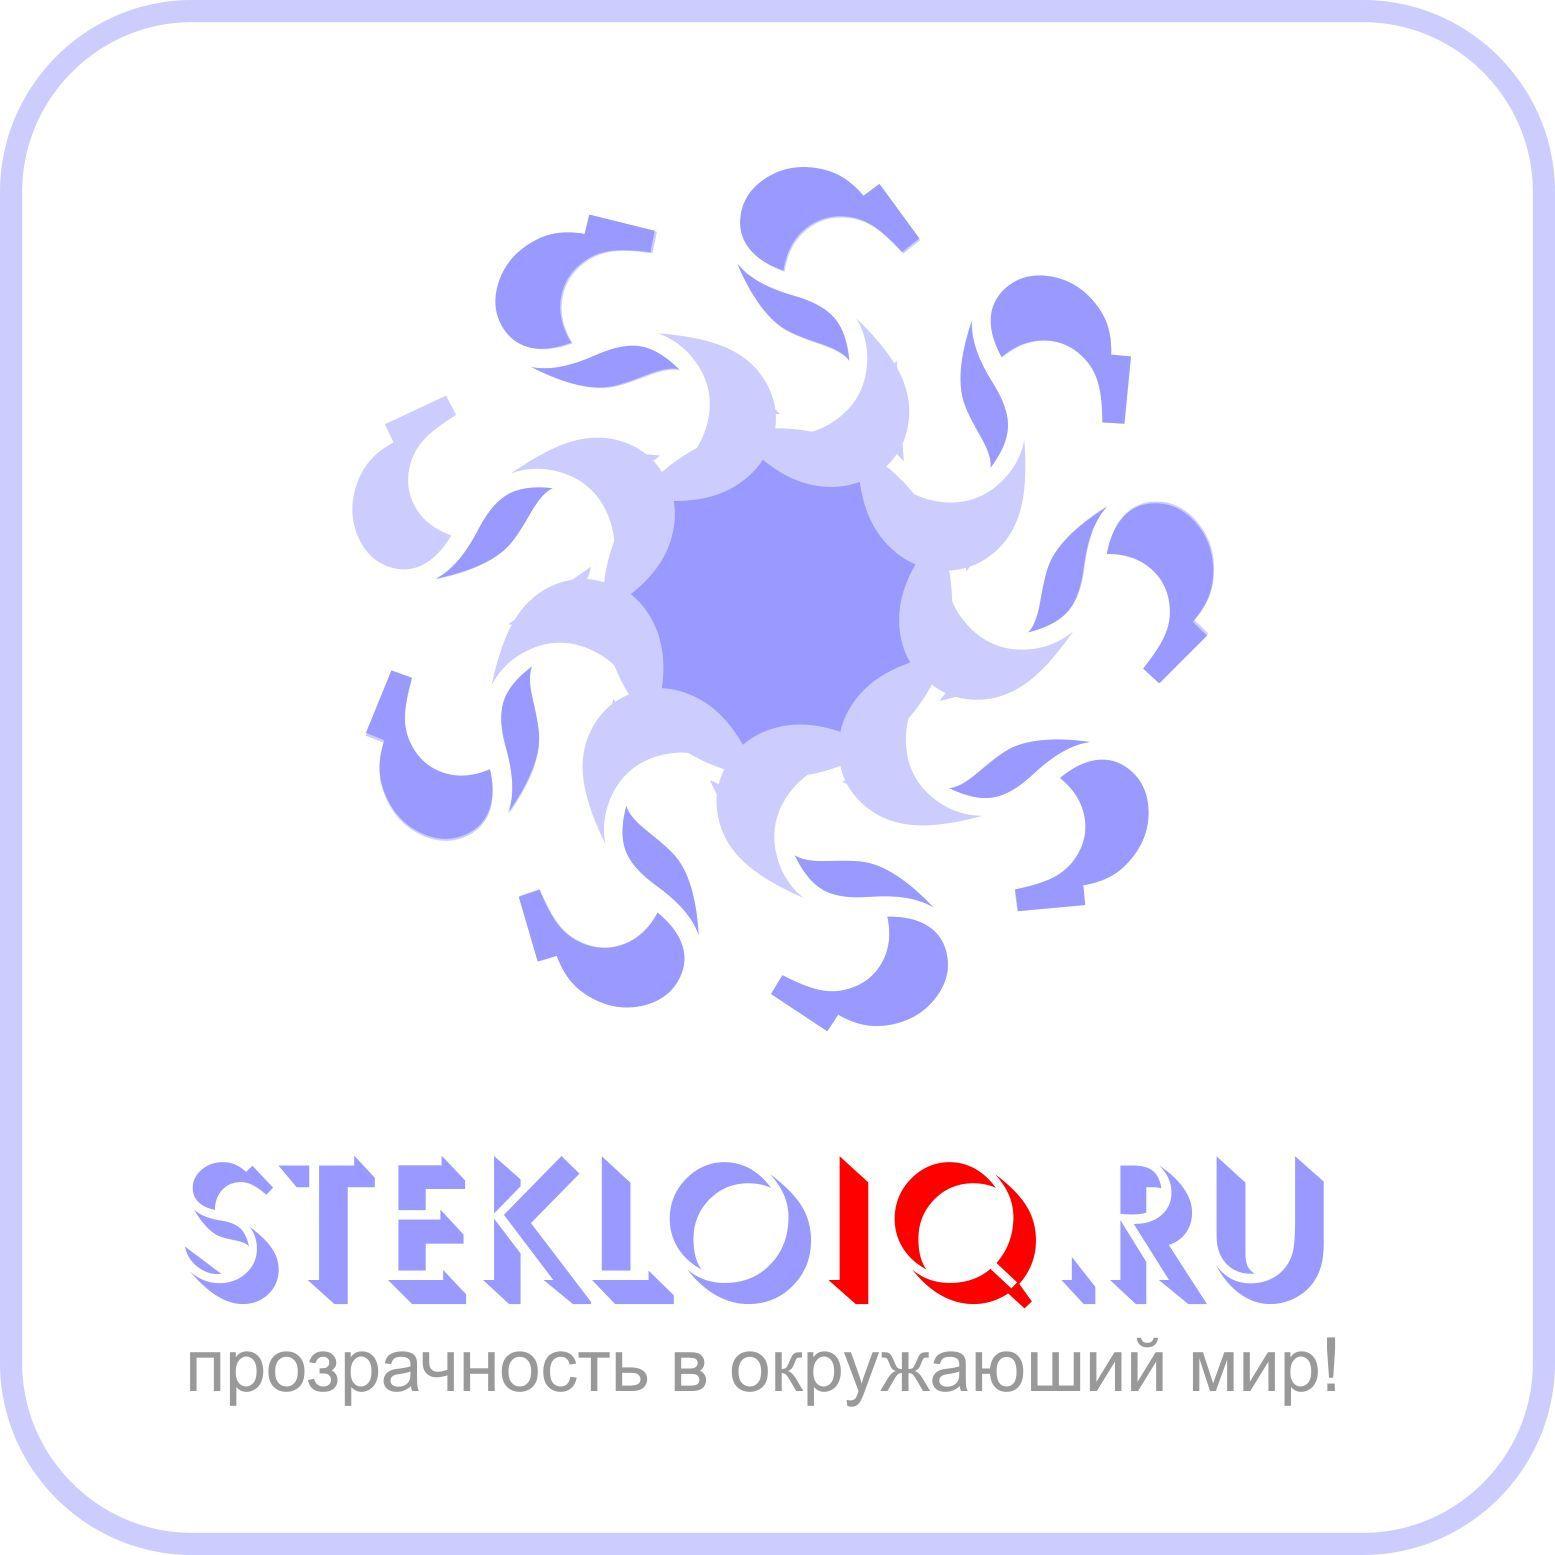 Разработка логотипа для архитектурной студии. - дизайнер AnatoliyInvito